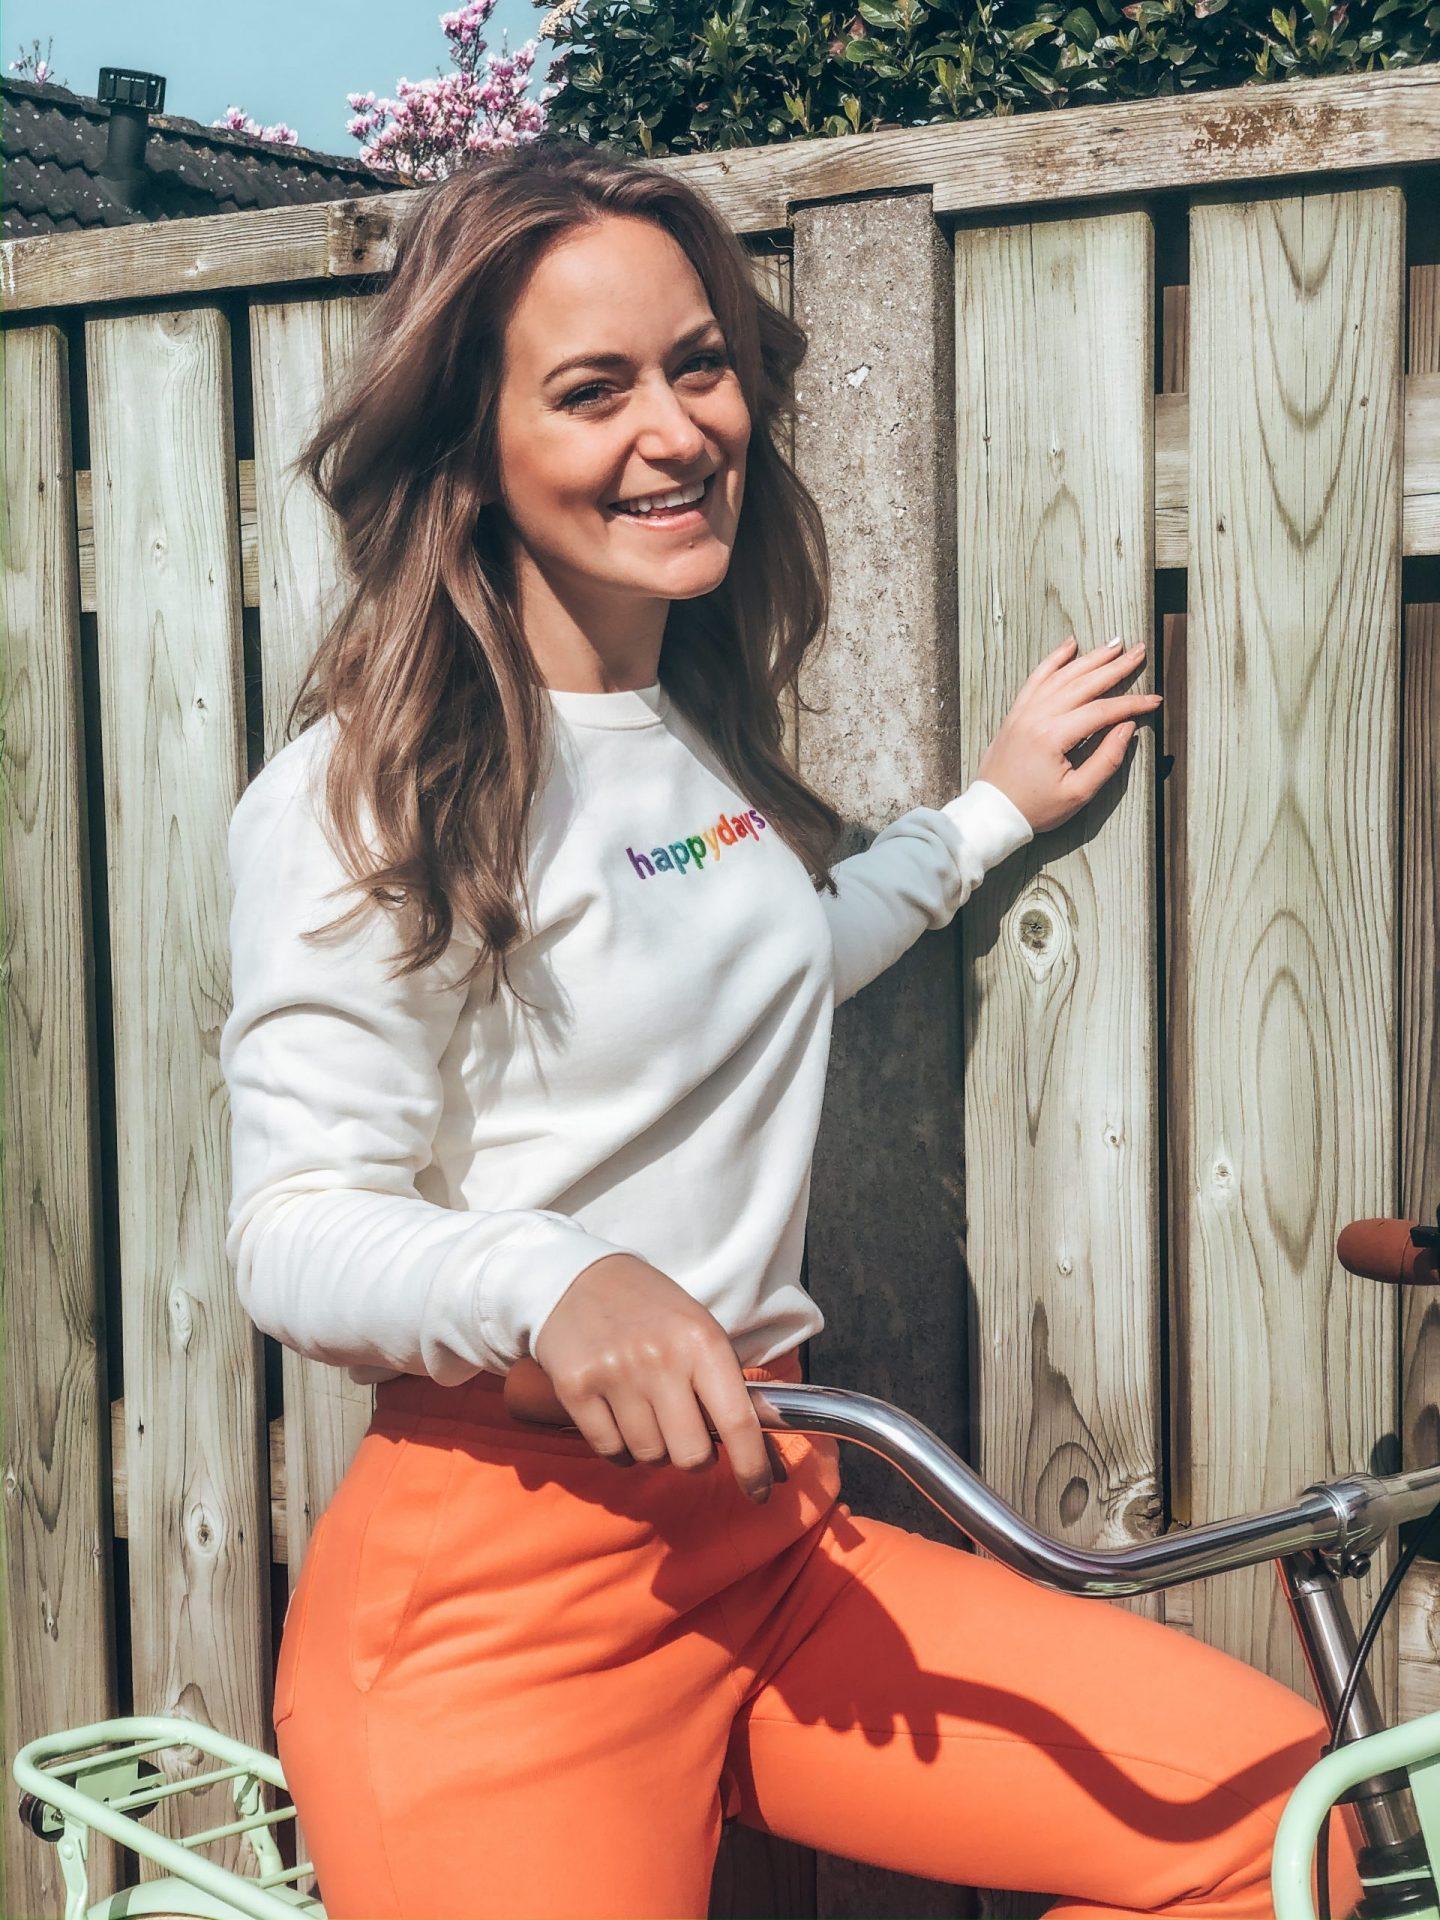 crown, fiets, fietsen, nieuwe fiets, crownfietsen, omafiets, transportfiets, french disorder, frenchdisorder, blog, xmariekie, blogger